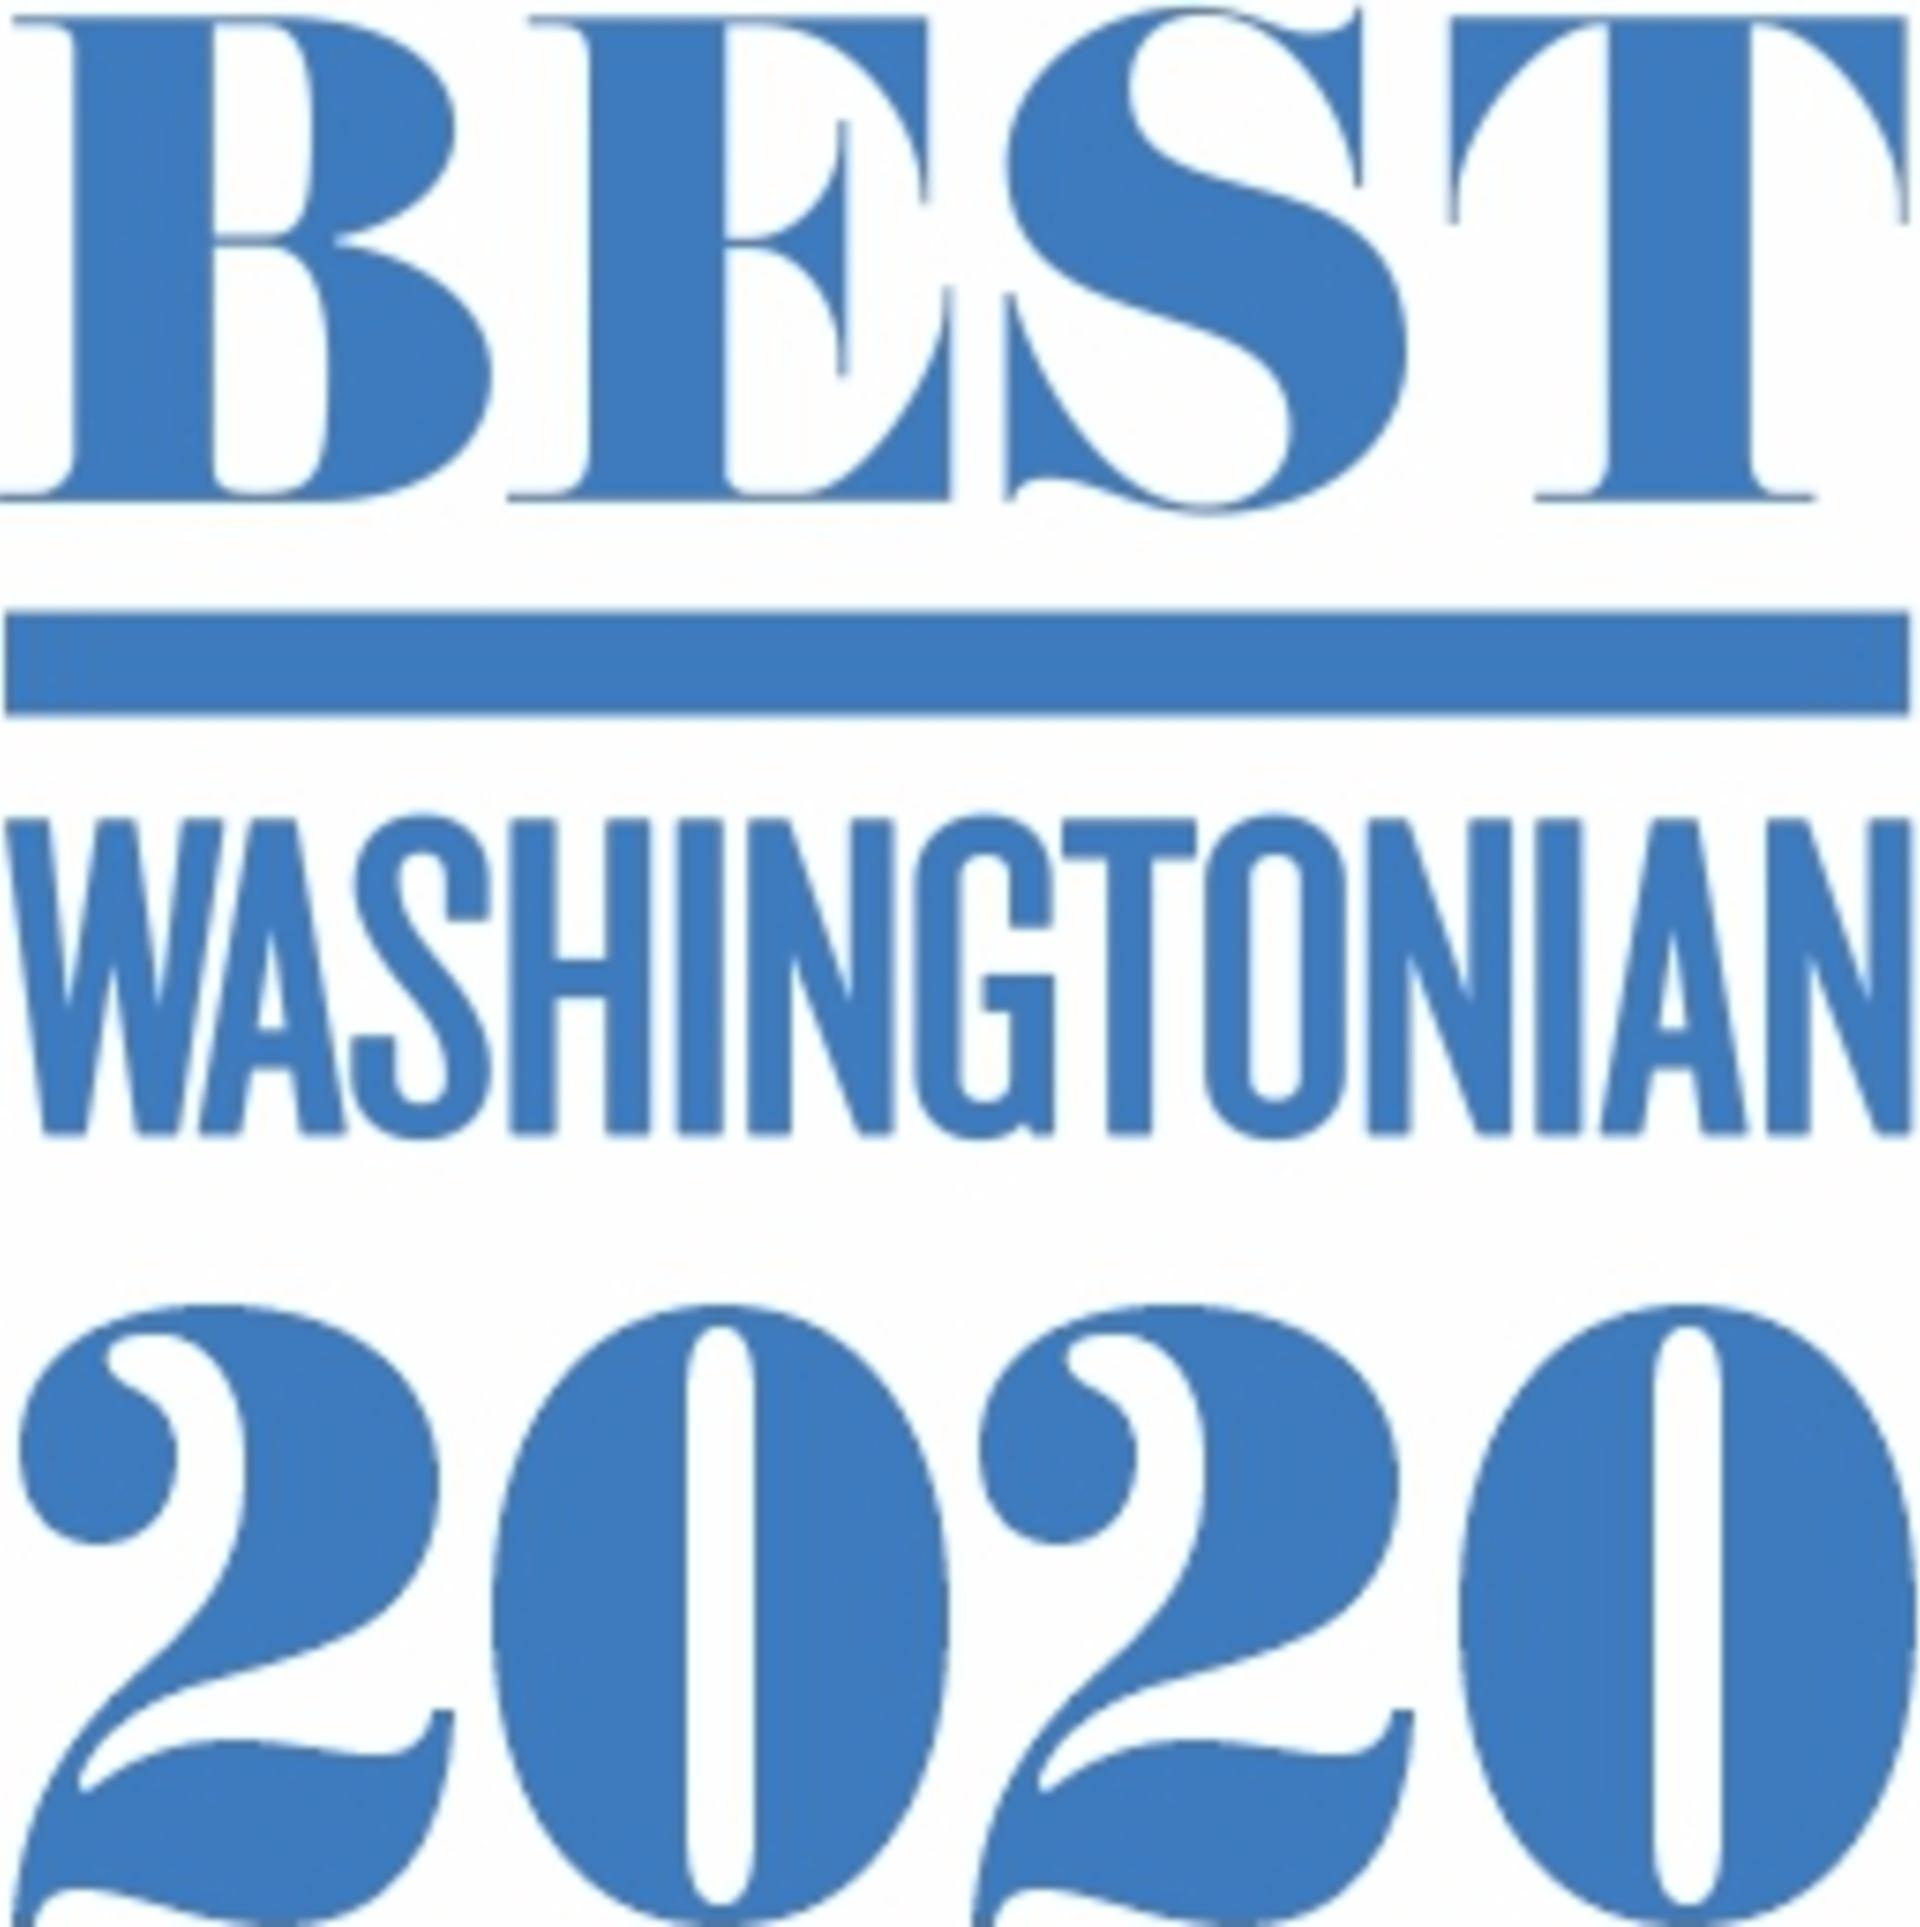 Washingtonian Best 2020